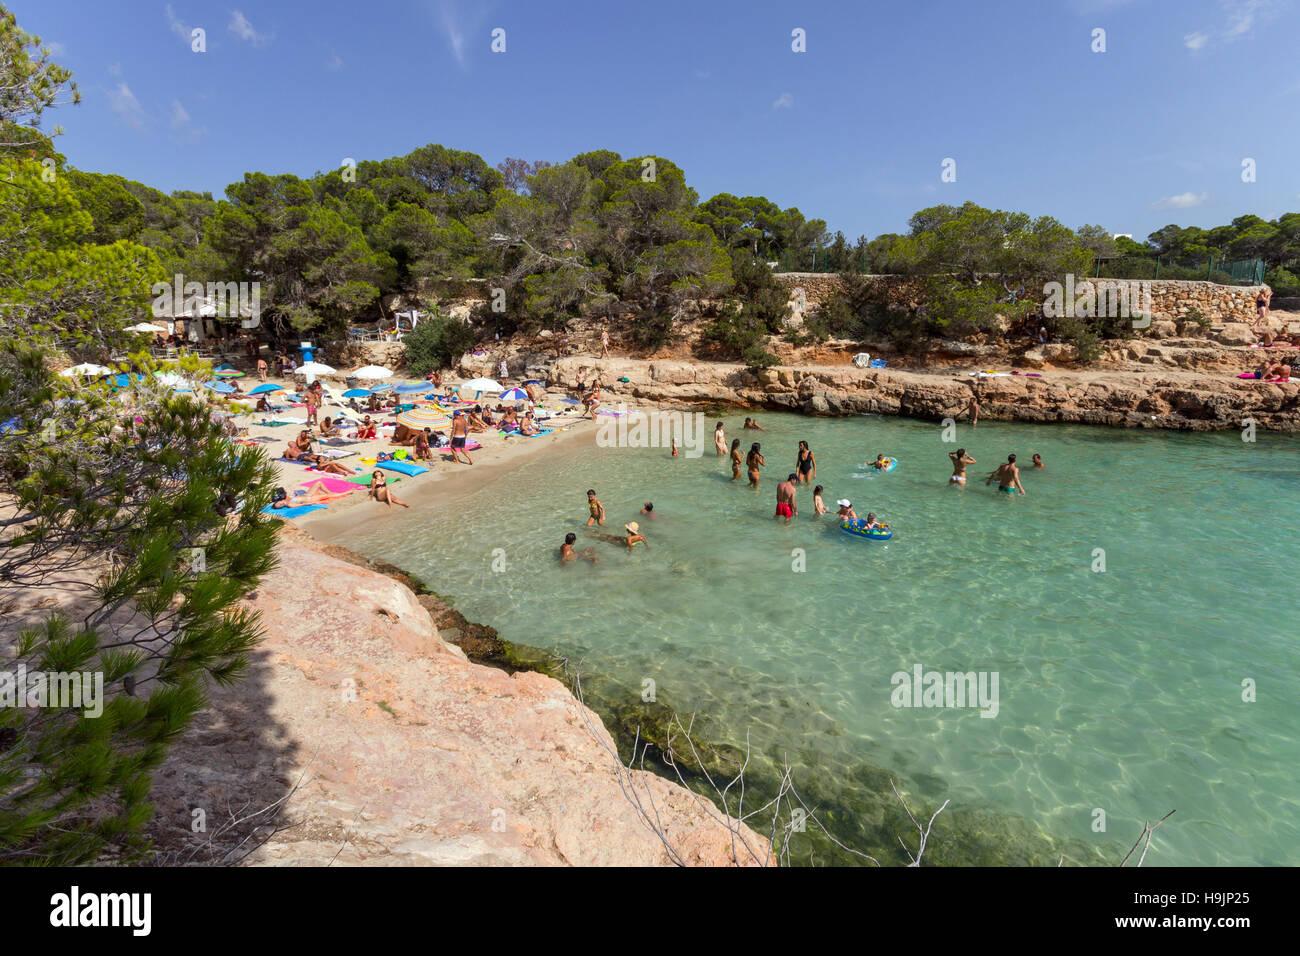 Spain, Balearic Island, Ibiza, Cala Gracioneta beach Stock Photo